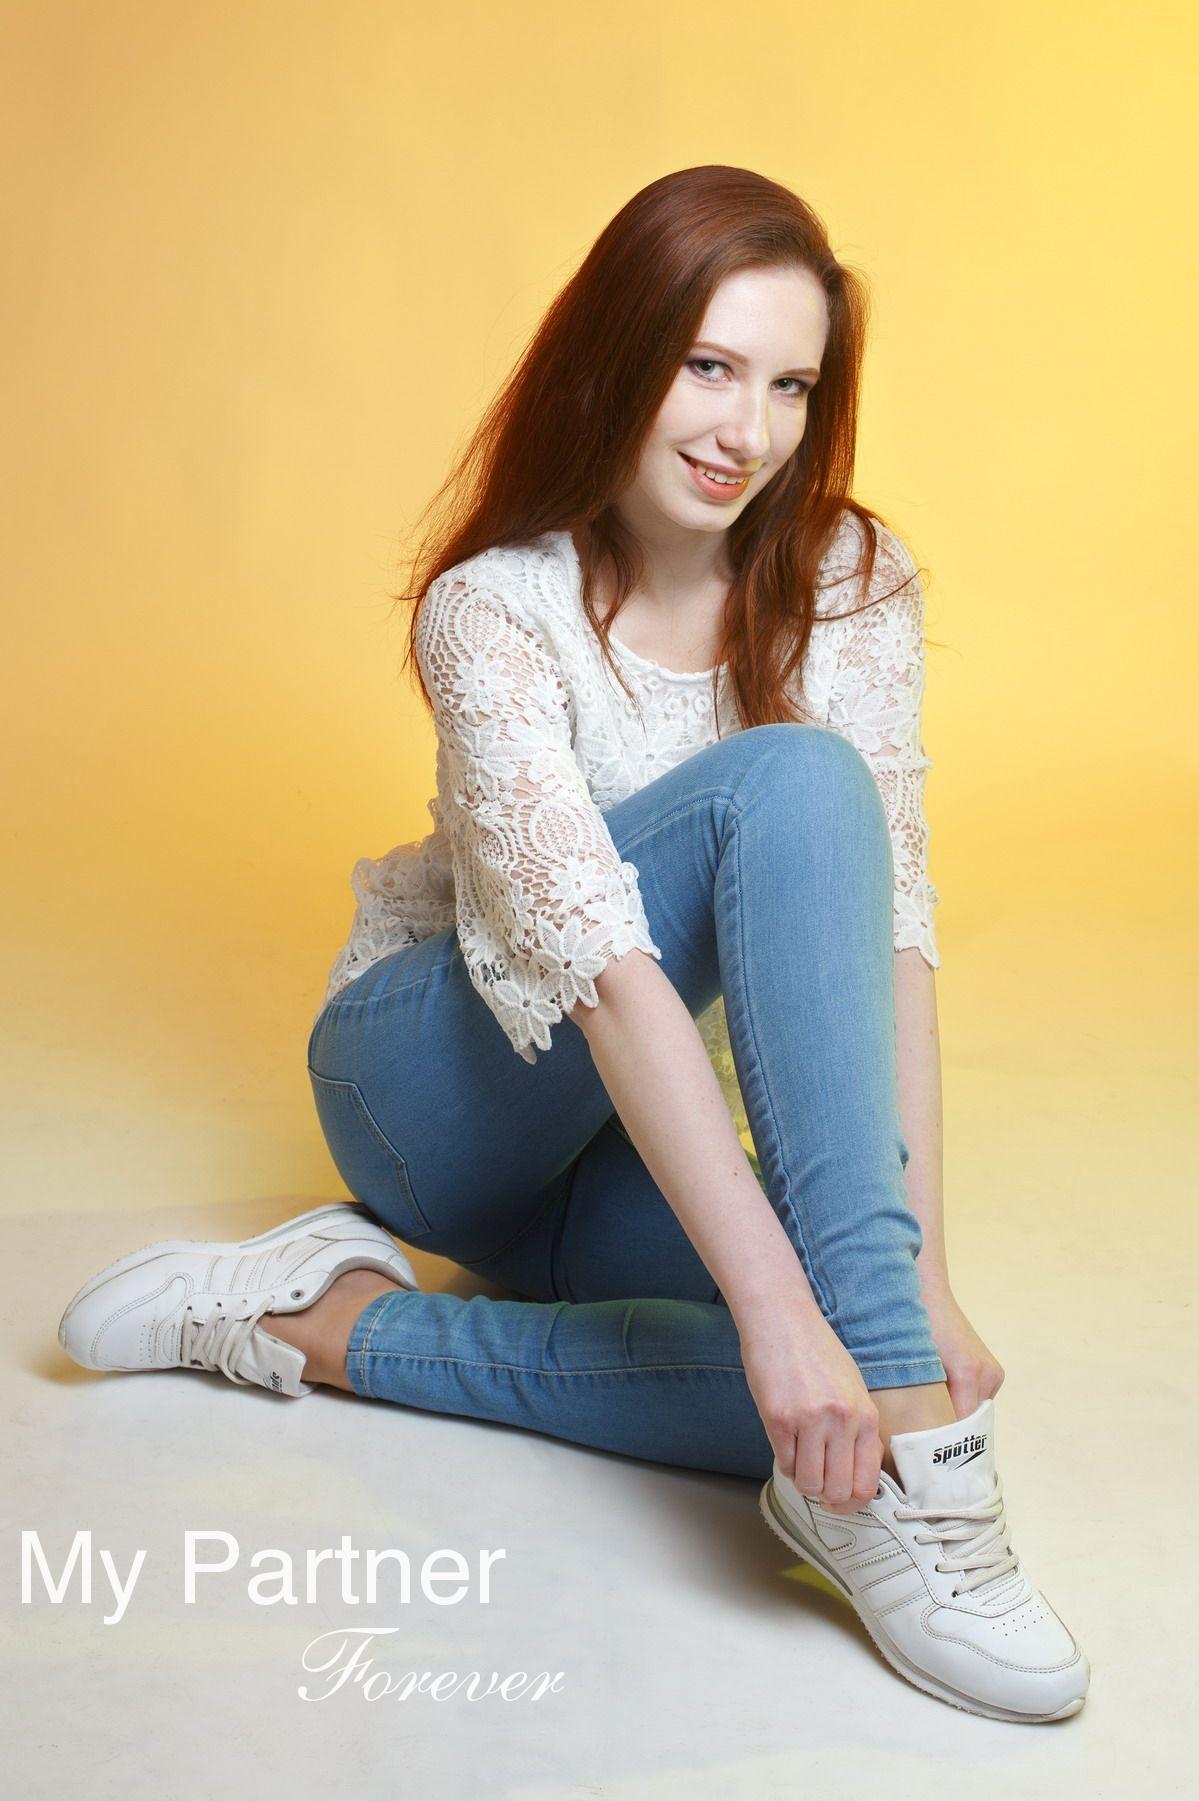 Stunning Bride from Belarus - Karina from Grodno, Belarus